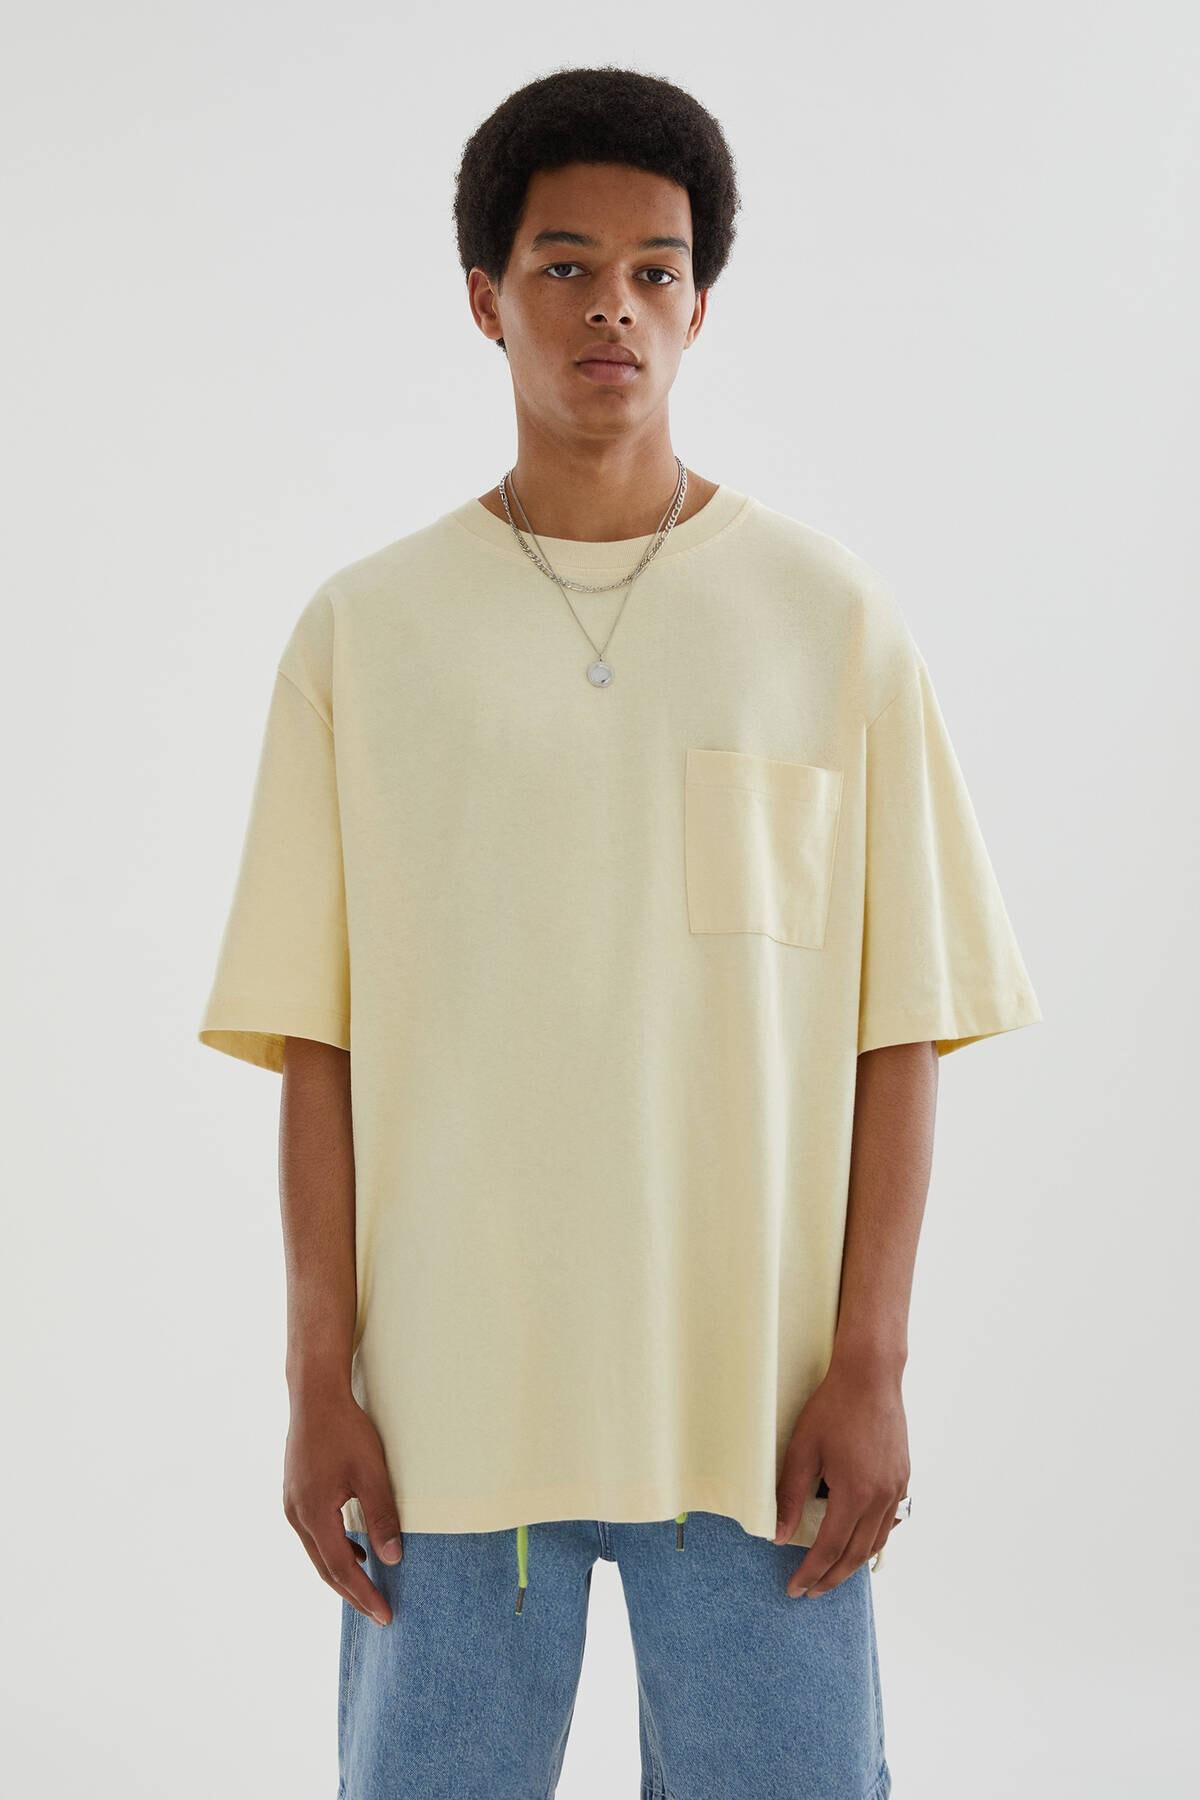 Pull & Bear Erkek Premium Kumaş Oversize T-Shirt 04241595